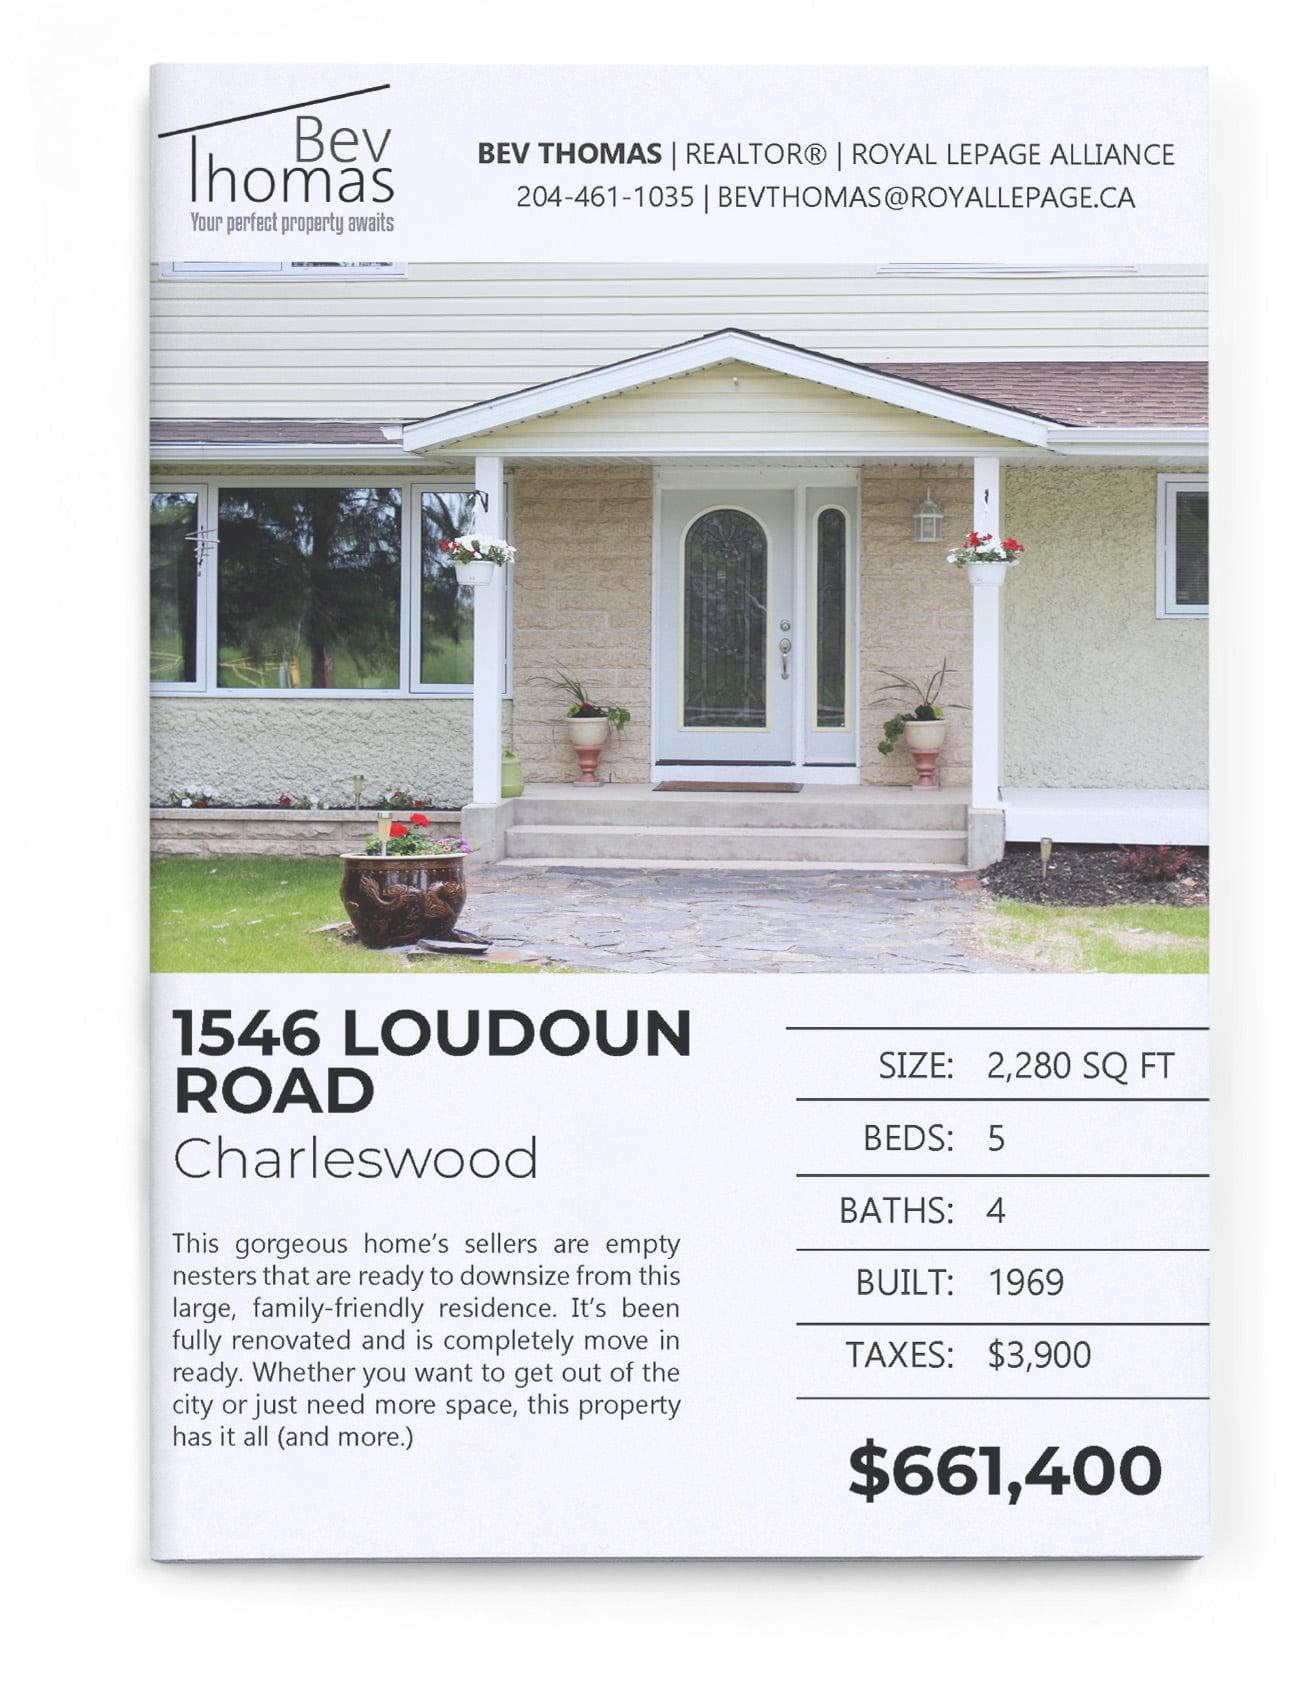 bev thomas real estate flyer